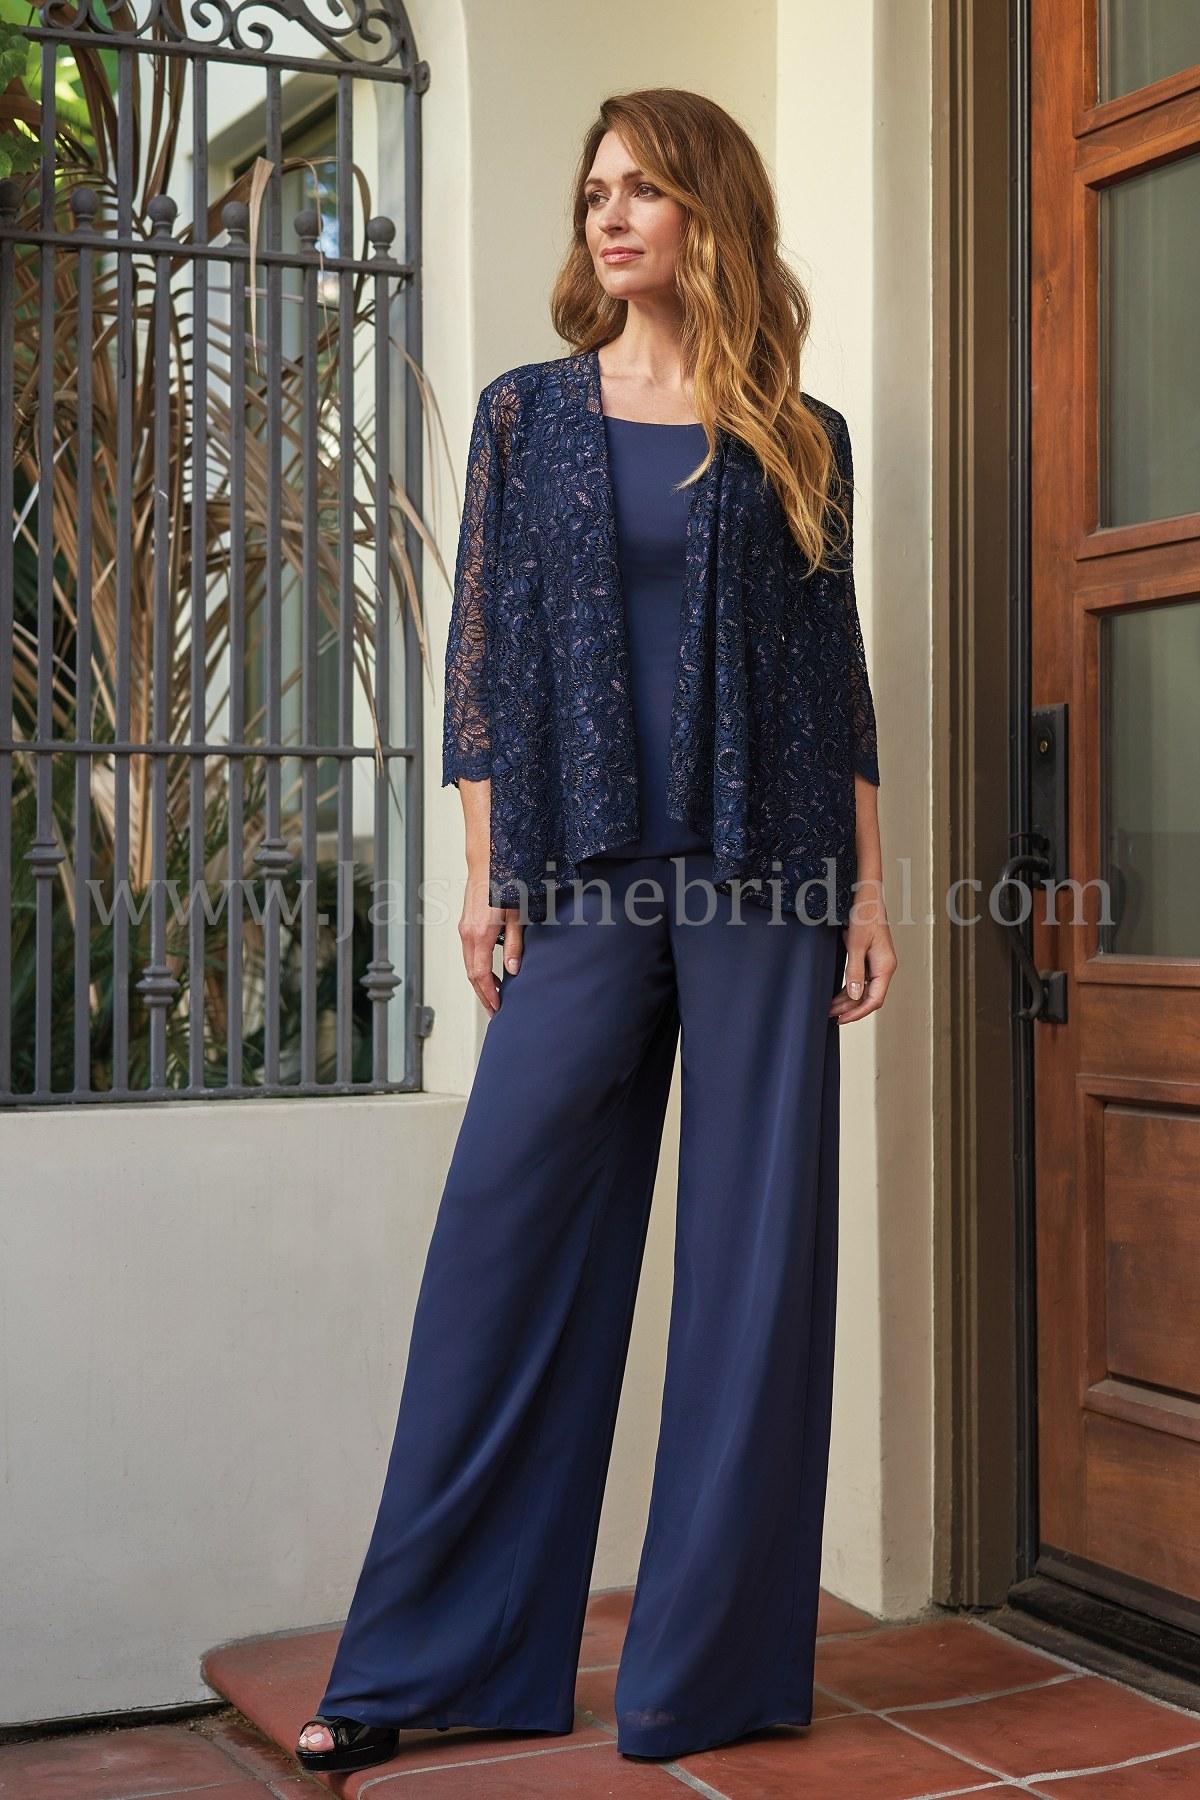 56f2b6dcdb3 J205063 Scoop Neckline Jade Chiffon MOB Pant Suit with Lace Jacket